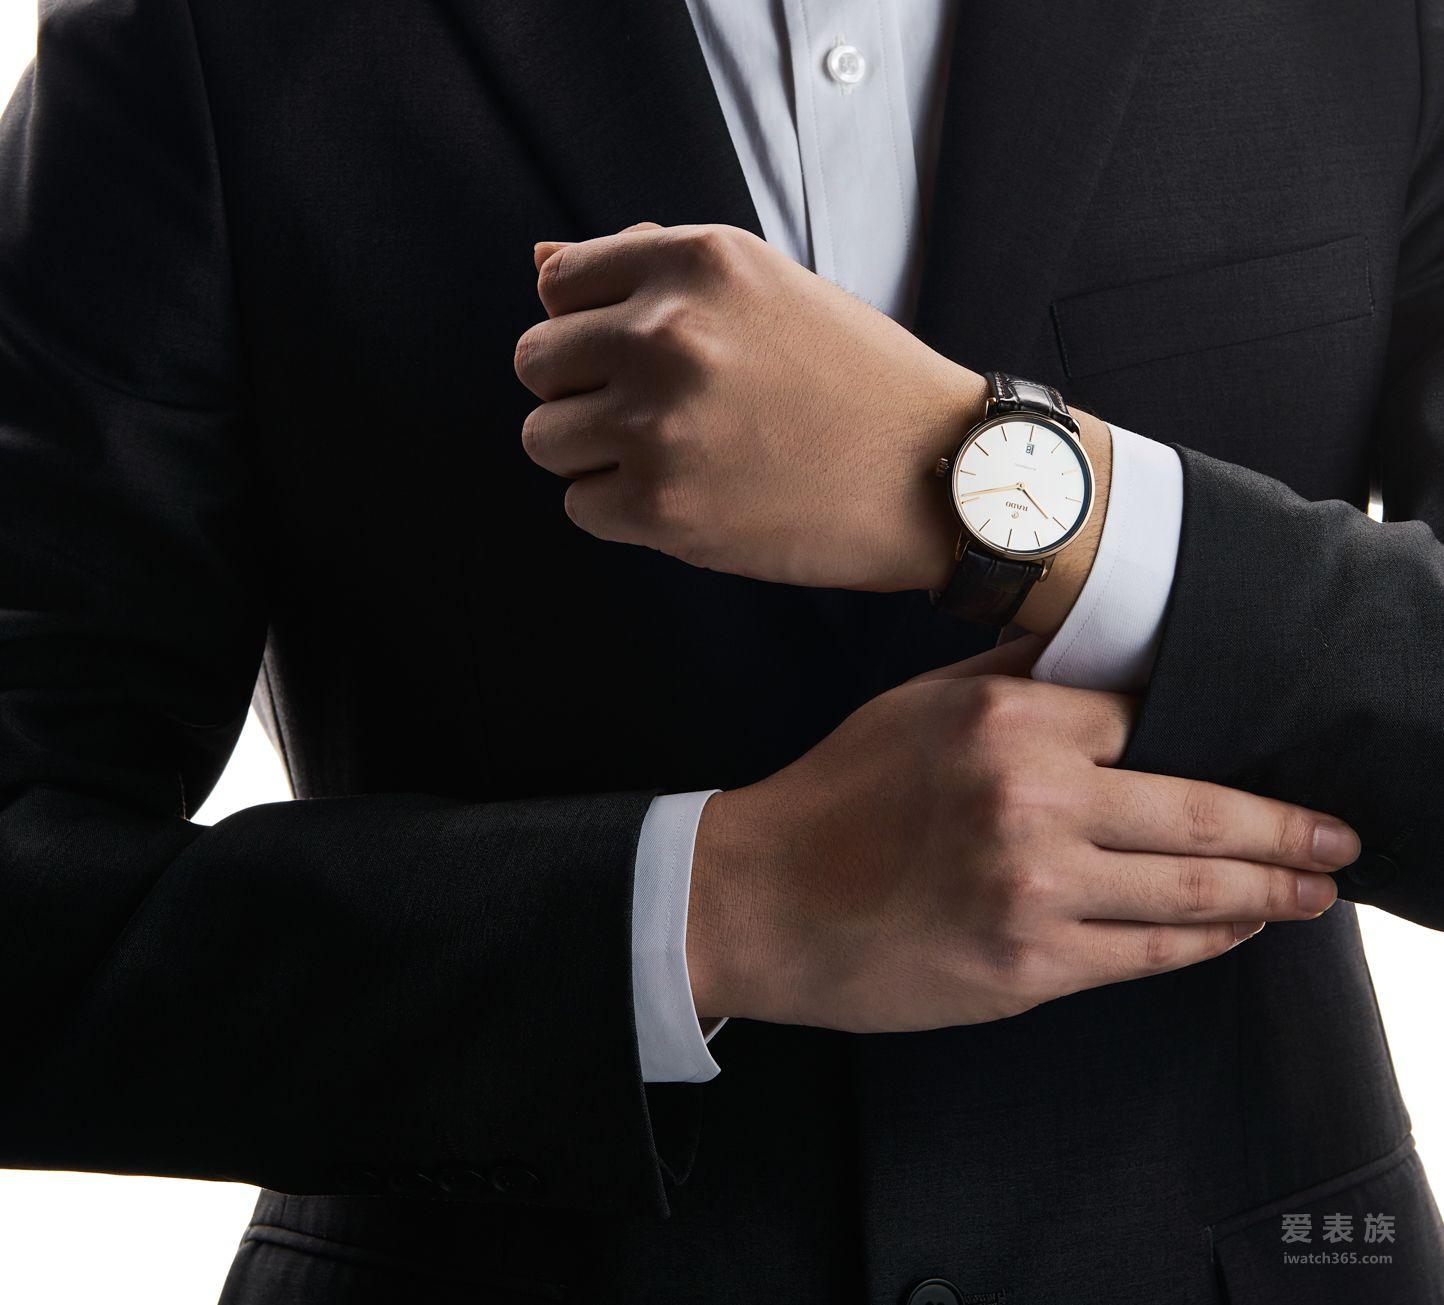 RADO瑞士雷达表DiaMaster钻霸系列CERAMOS™金属陶瓷自动机械腕表_玫瑰金色_情境图5-12